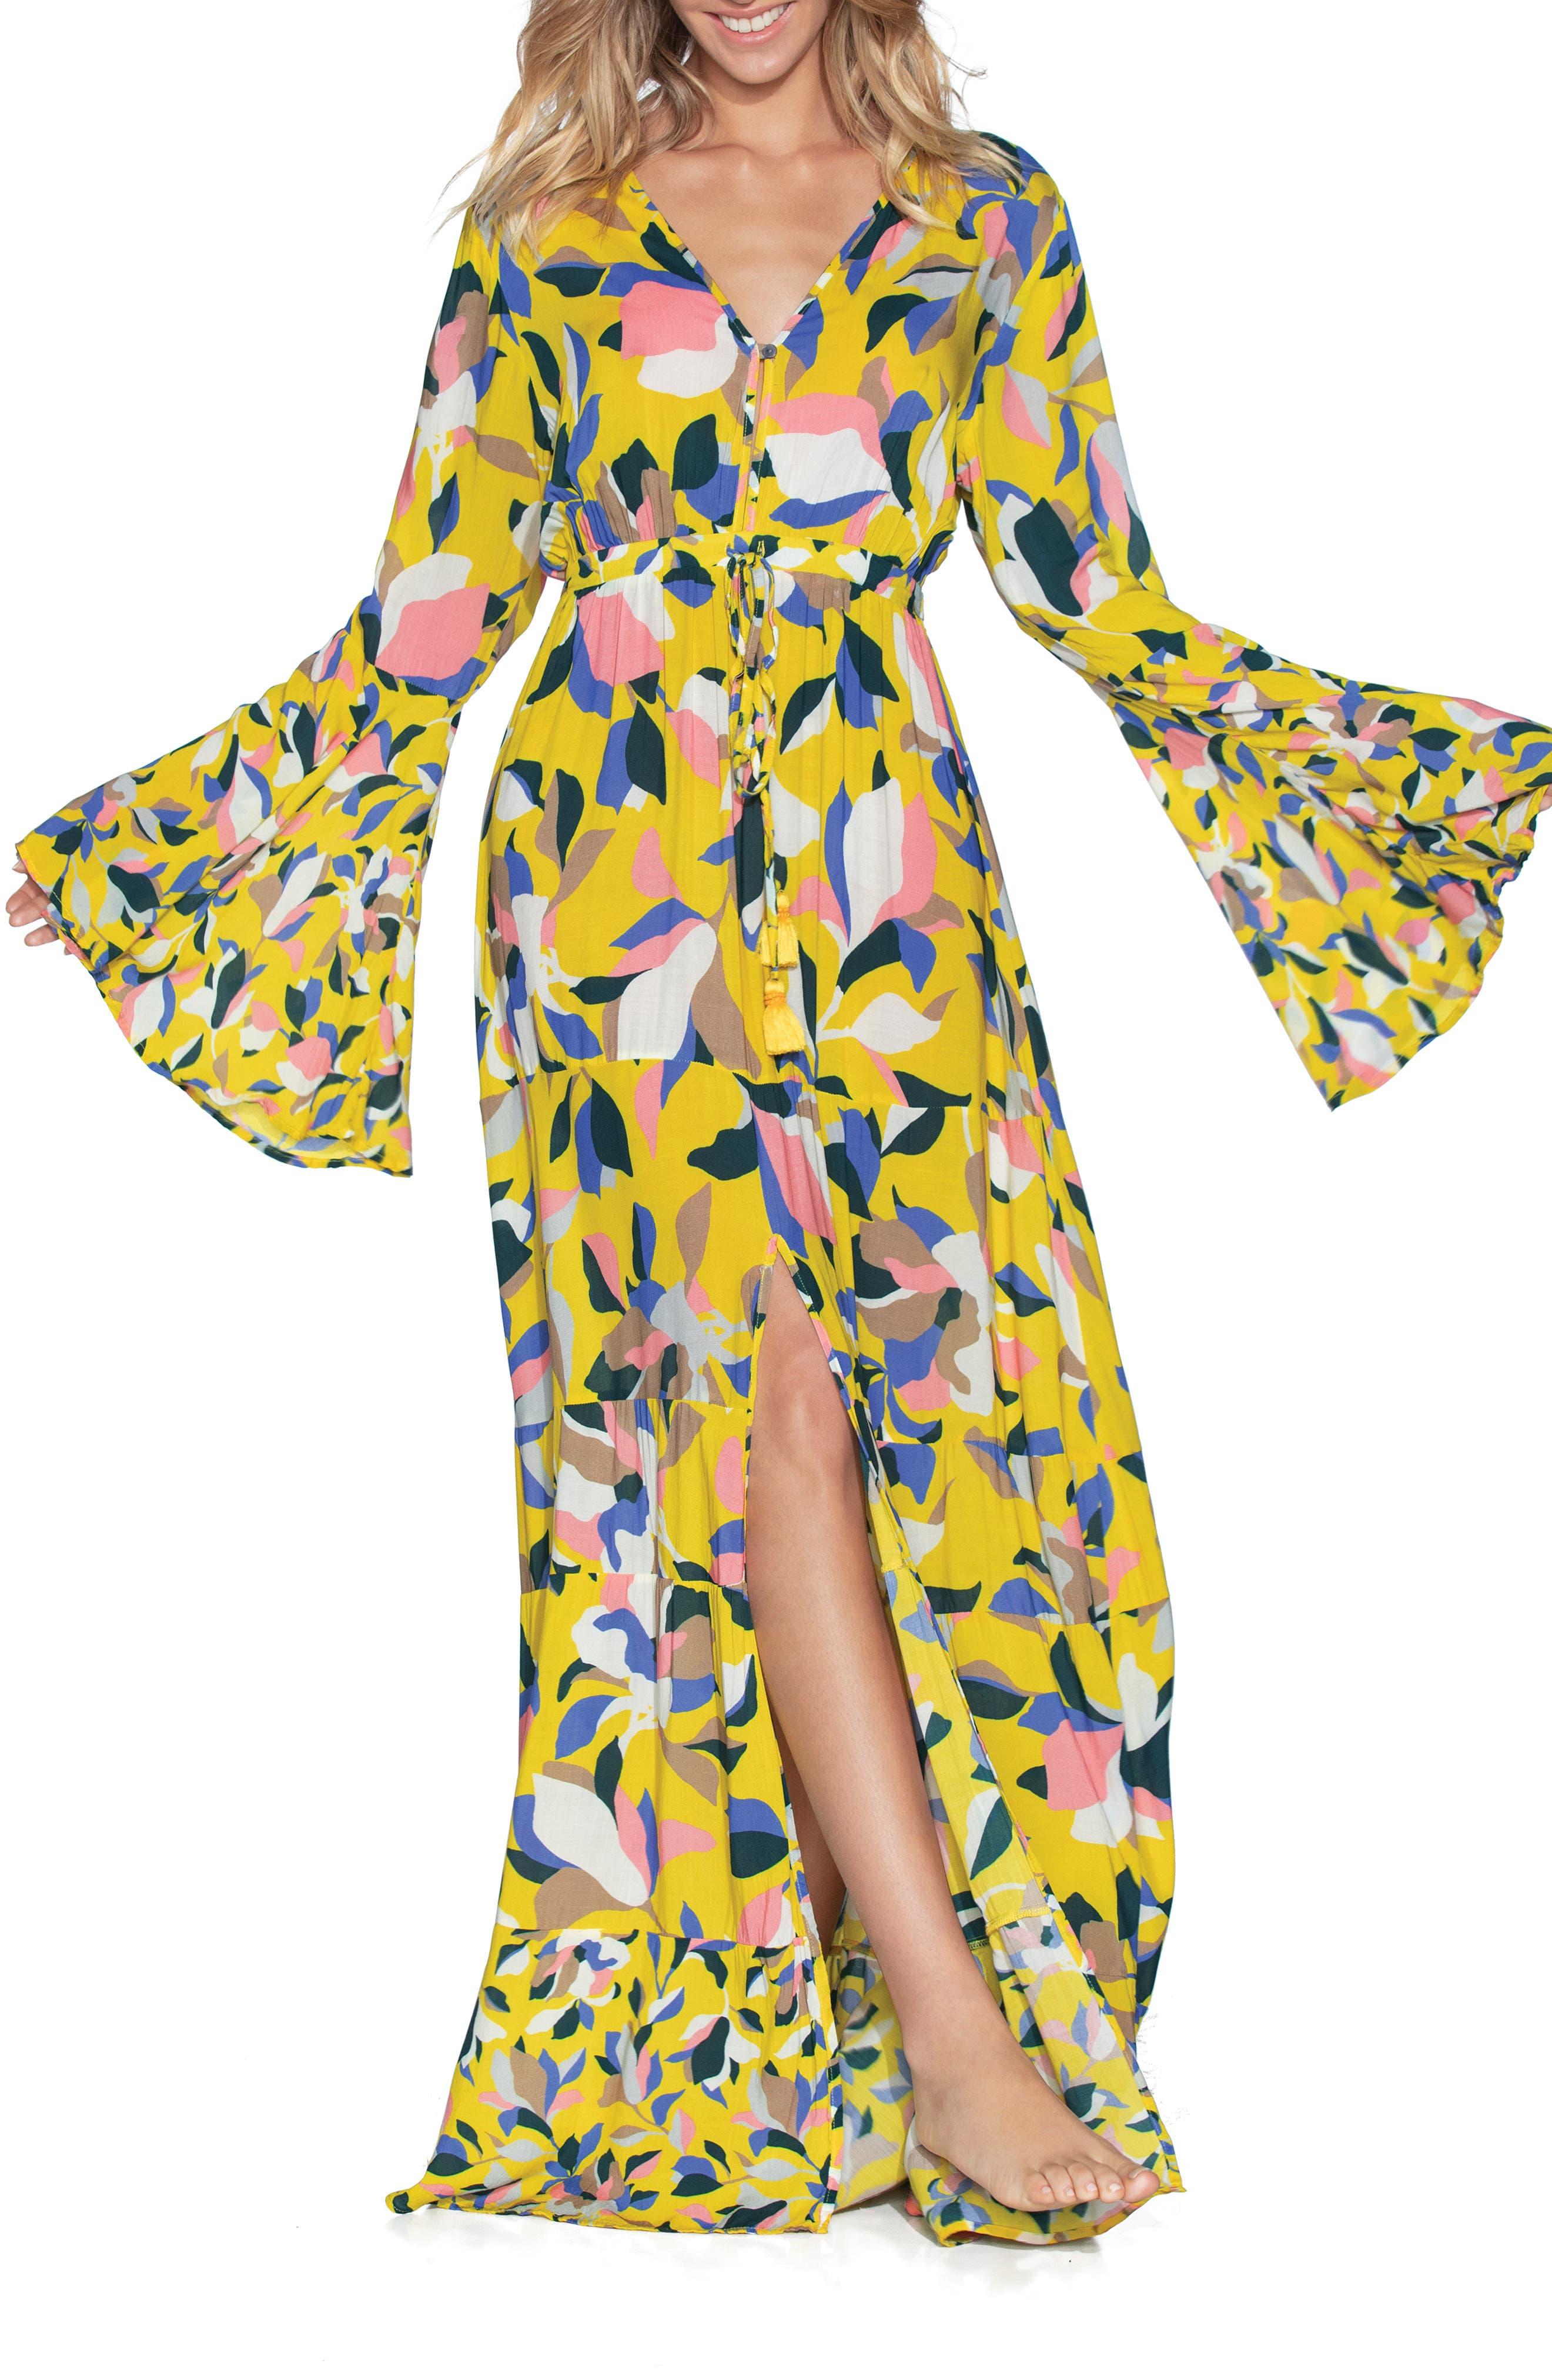 Maaji Yellow Anemone Cover-Up Maxi Dress